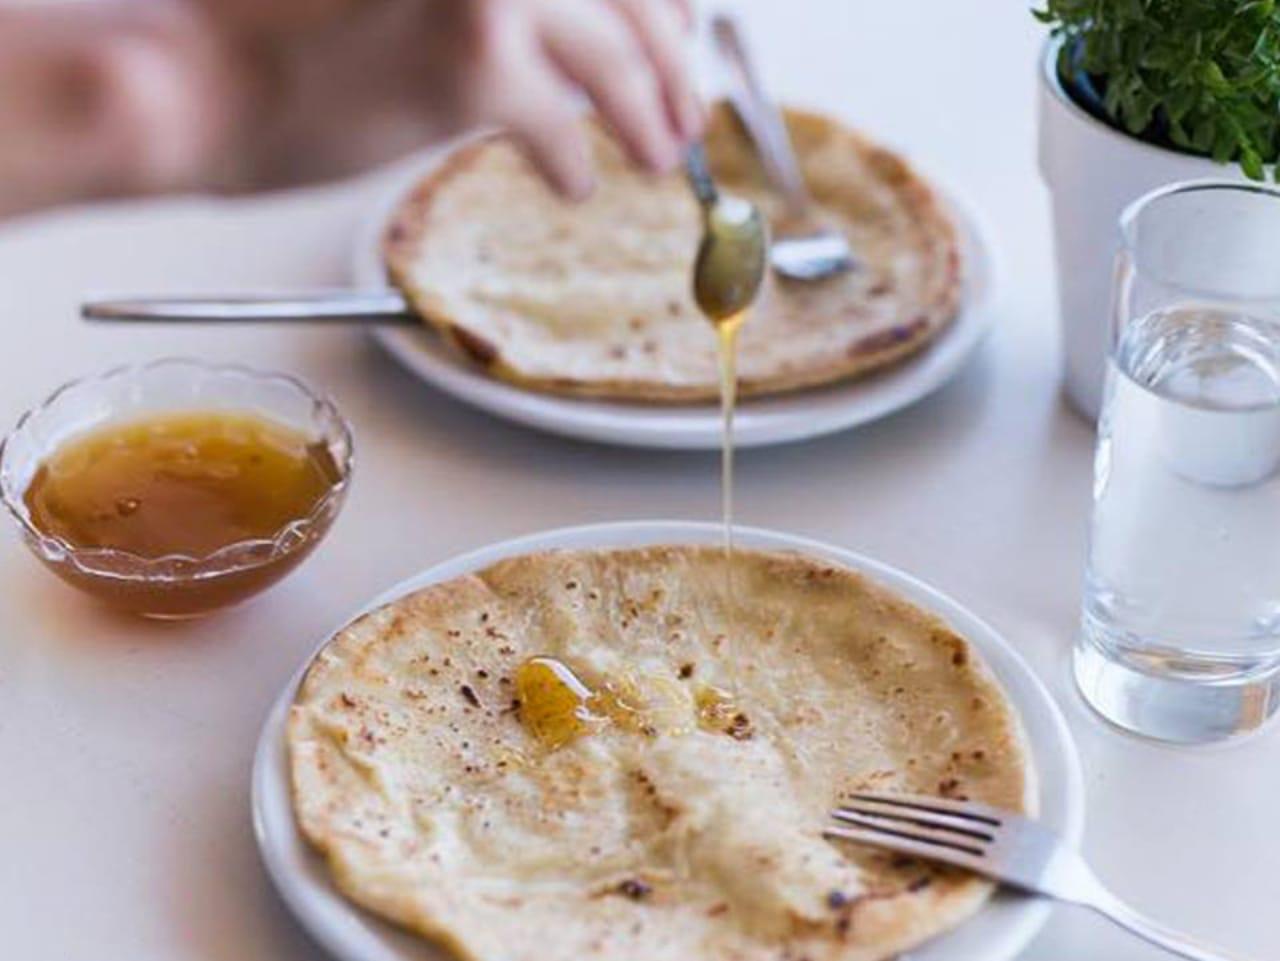 lefka ori restaurant sfakia villge, chora sfakion lefka ori tavern, lefka ori restaurant sfakia chania, best restaurants sfakia village crete, where to eat sfakia village